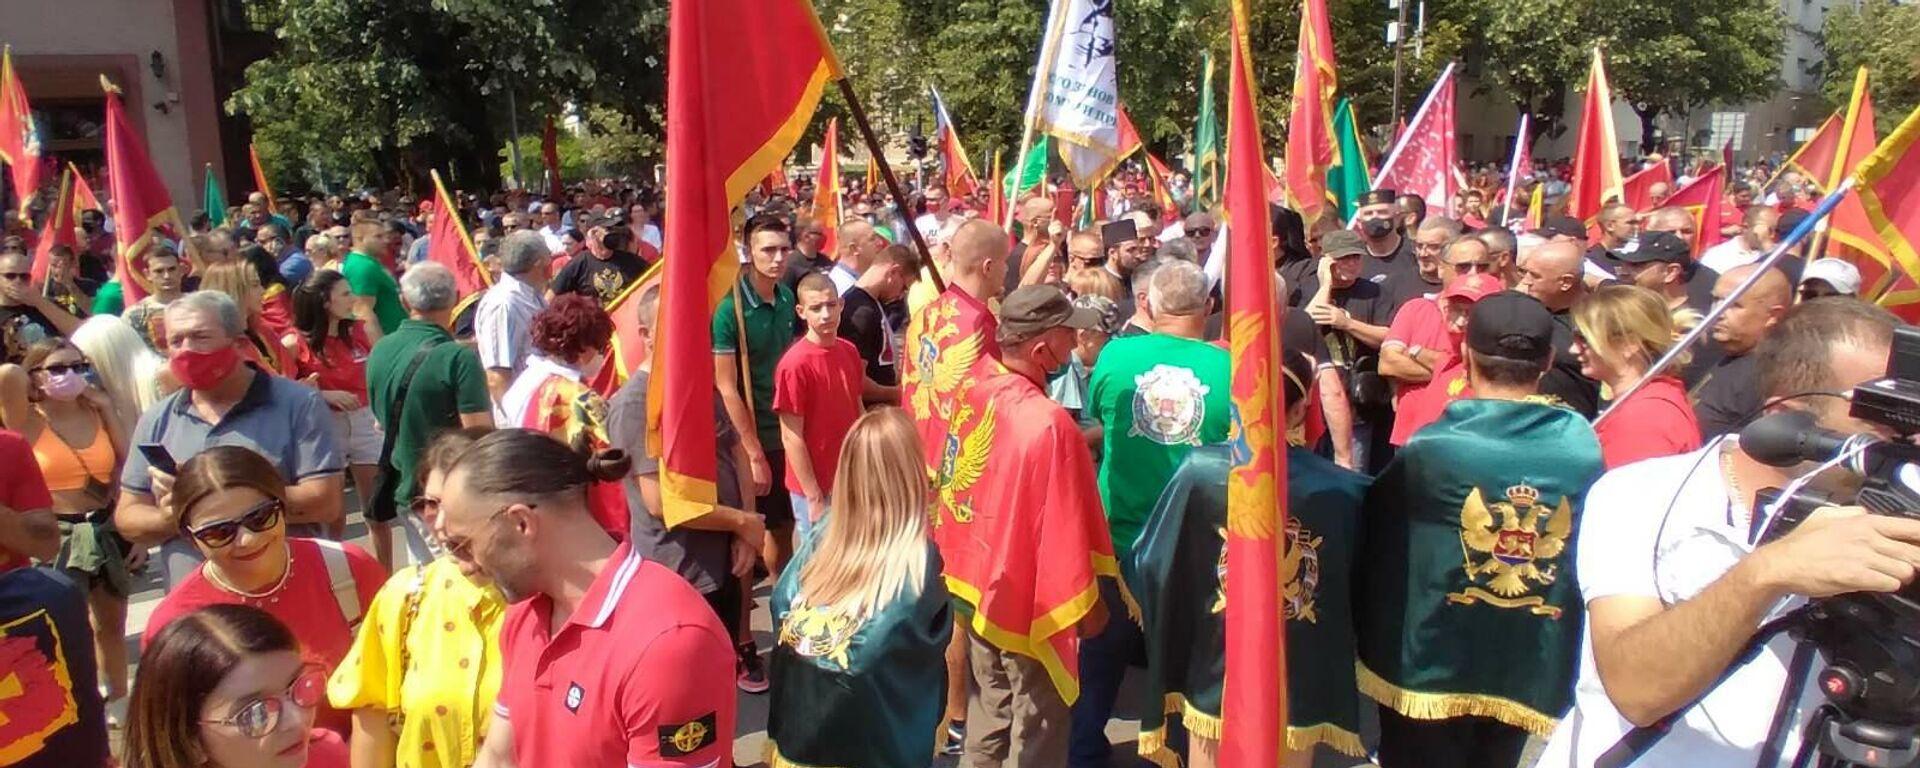 Protest na Cetinju protiv ustoličenja mitropolita Joanikija - Sputnik Srbija, 1920, 01.09.2021